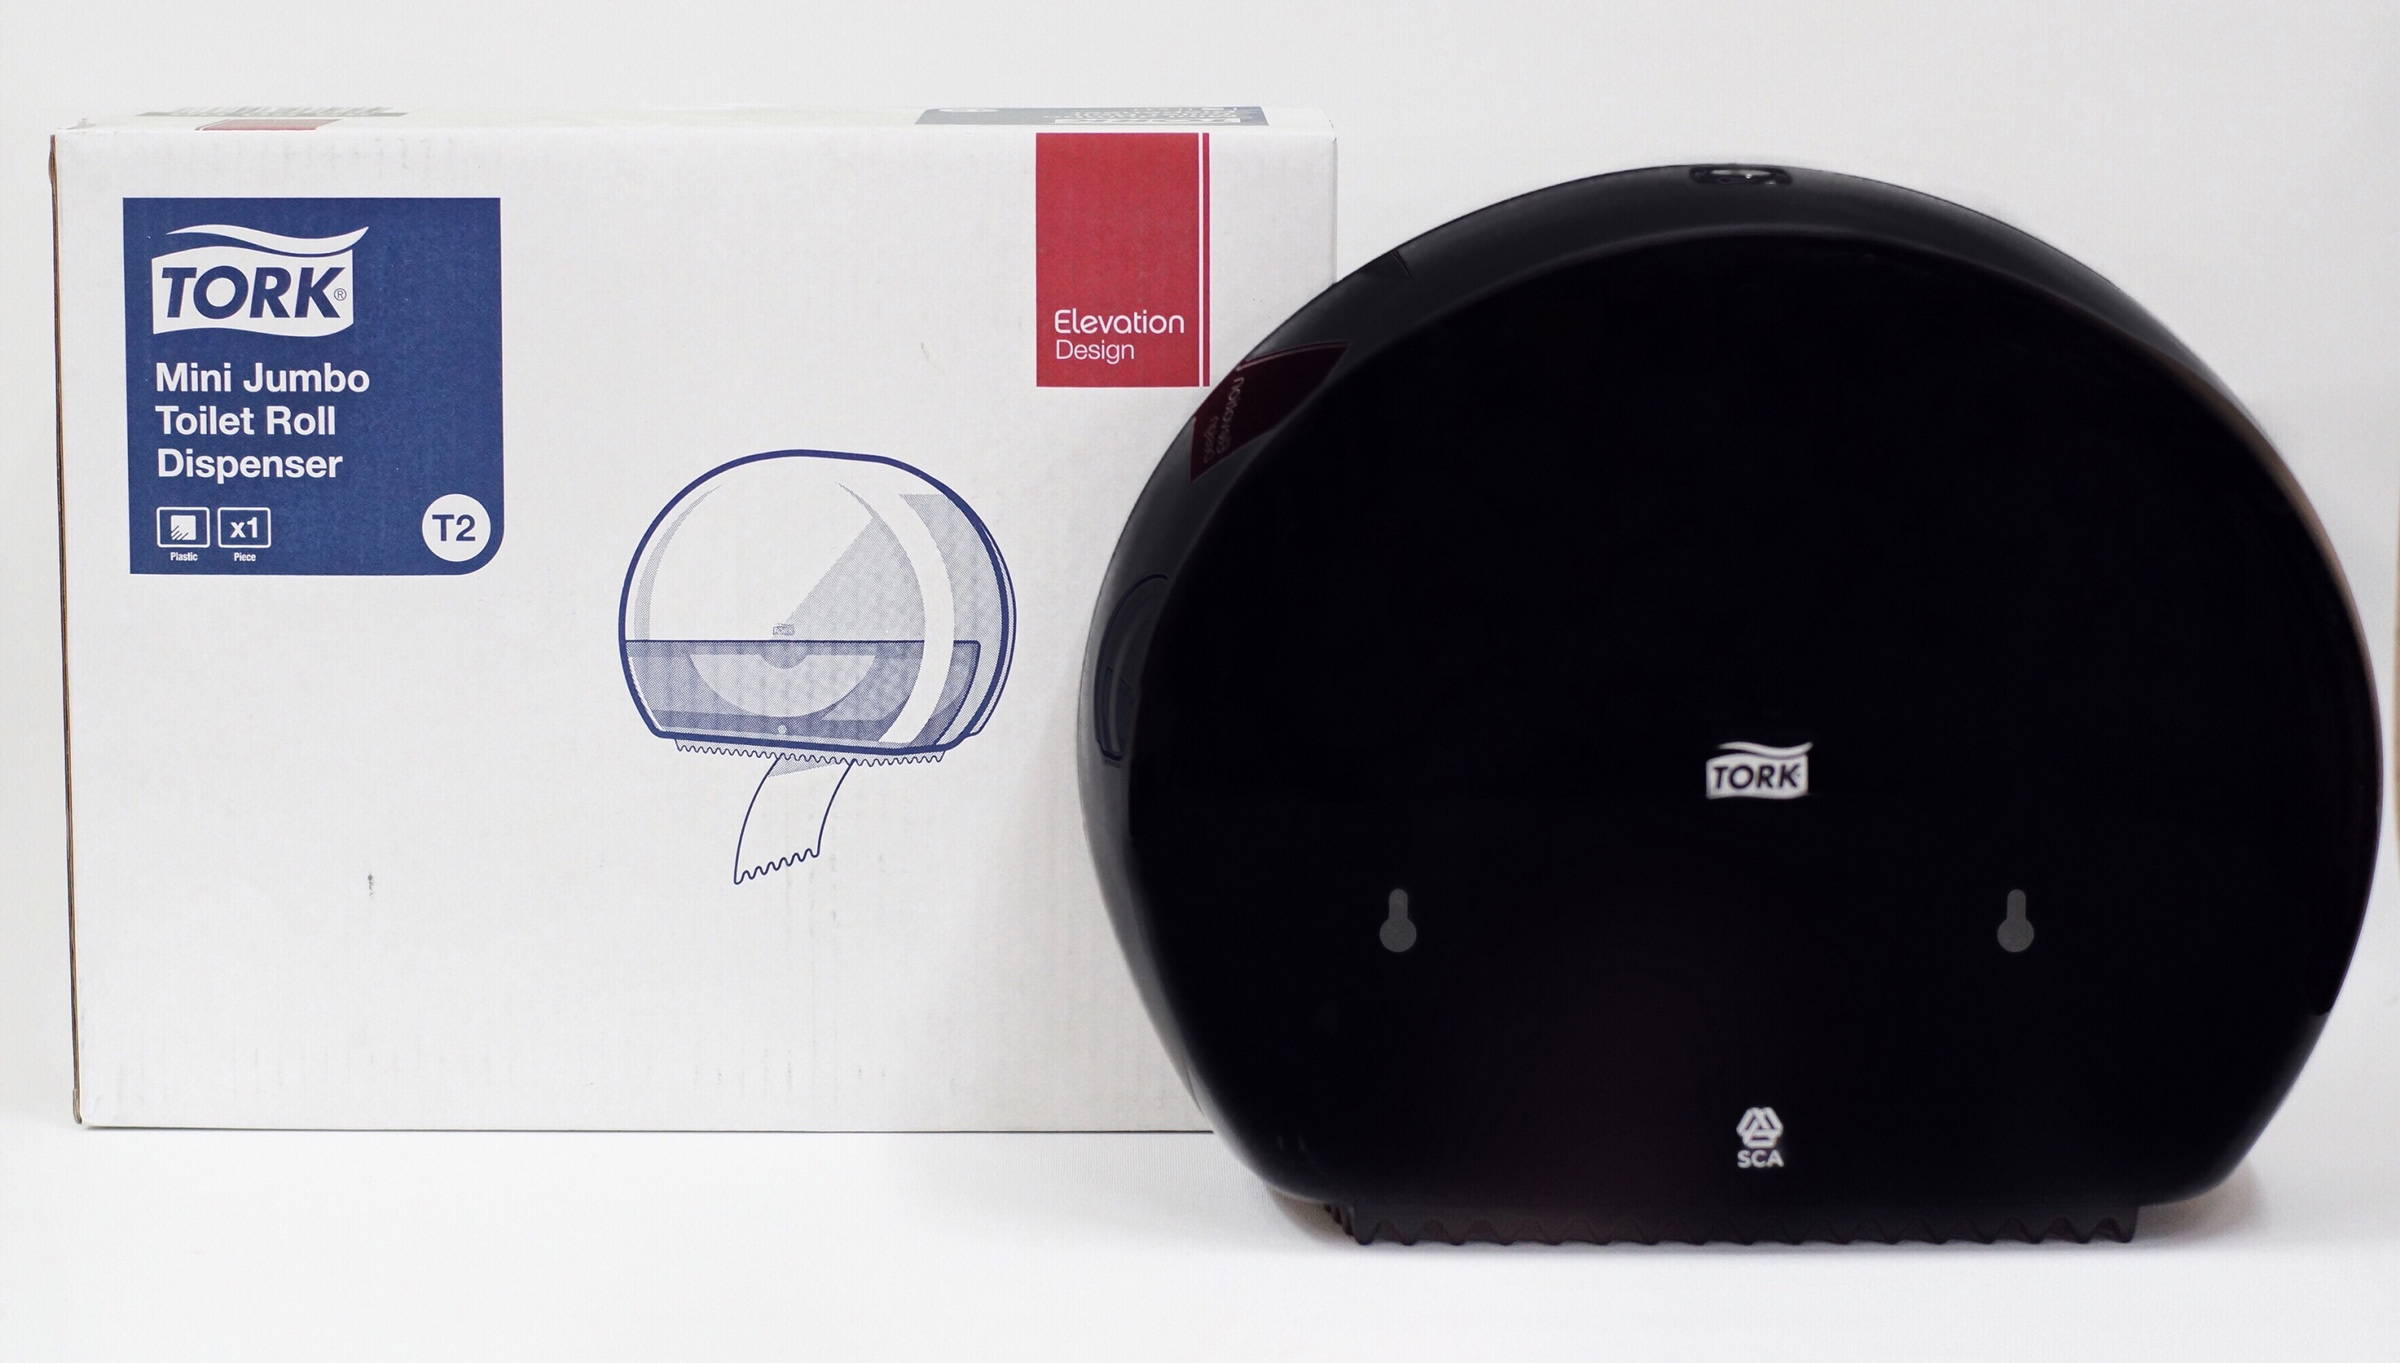 Диспенсер для туалетной бумаги в рулонах Джамбо,Elevation, пластик, (T2), черн. Tork - фото 5